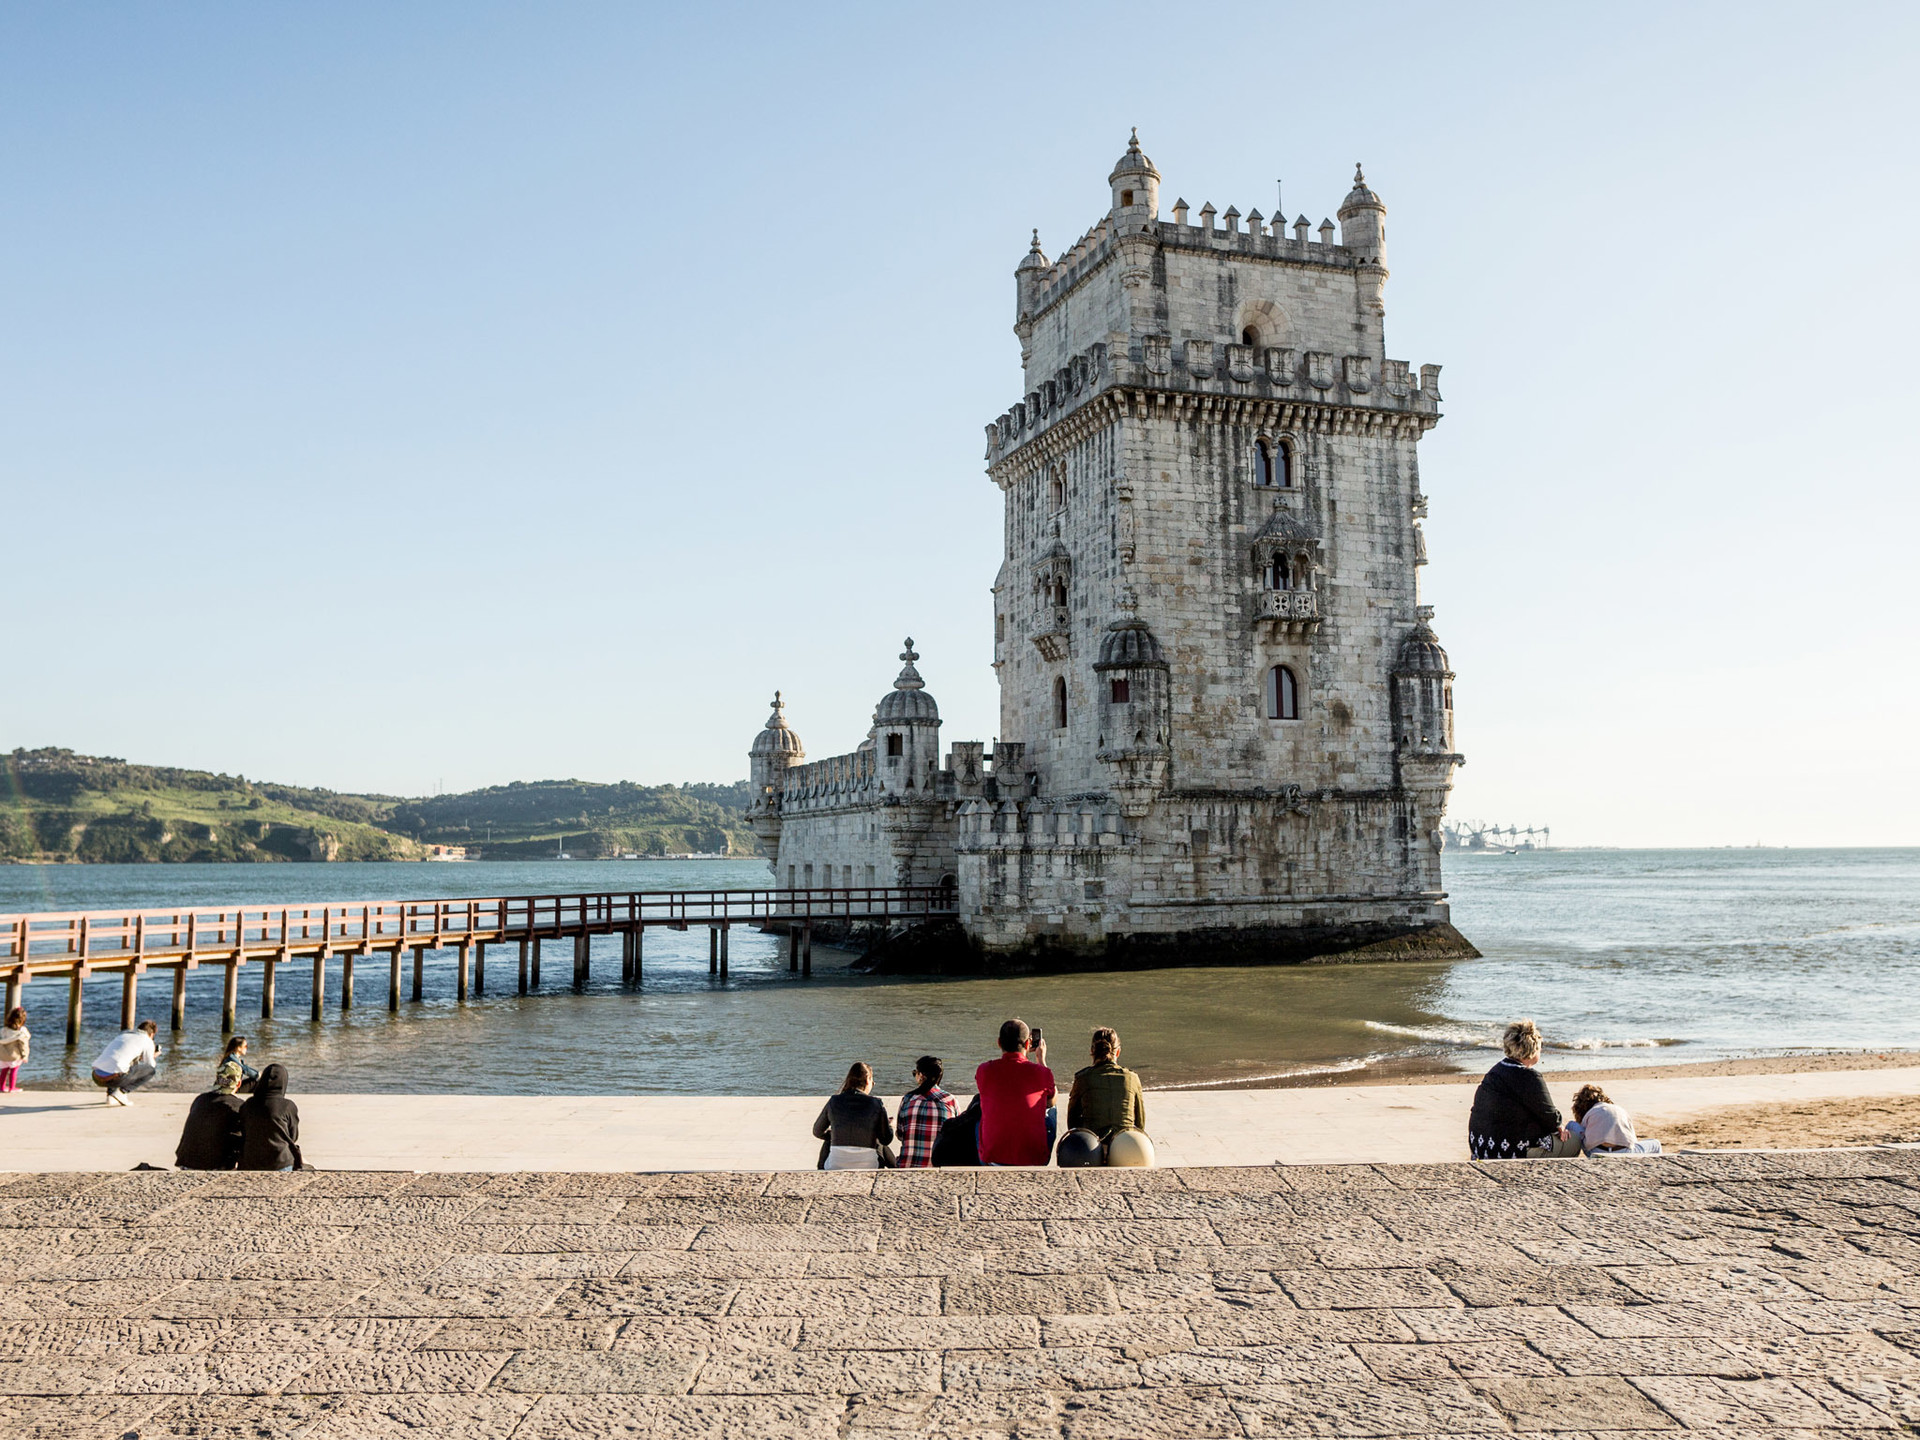 Parcheggio libero in centro a Lisbona - Forum Lisbona ...